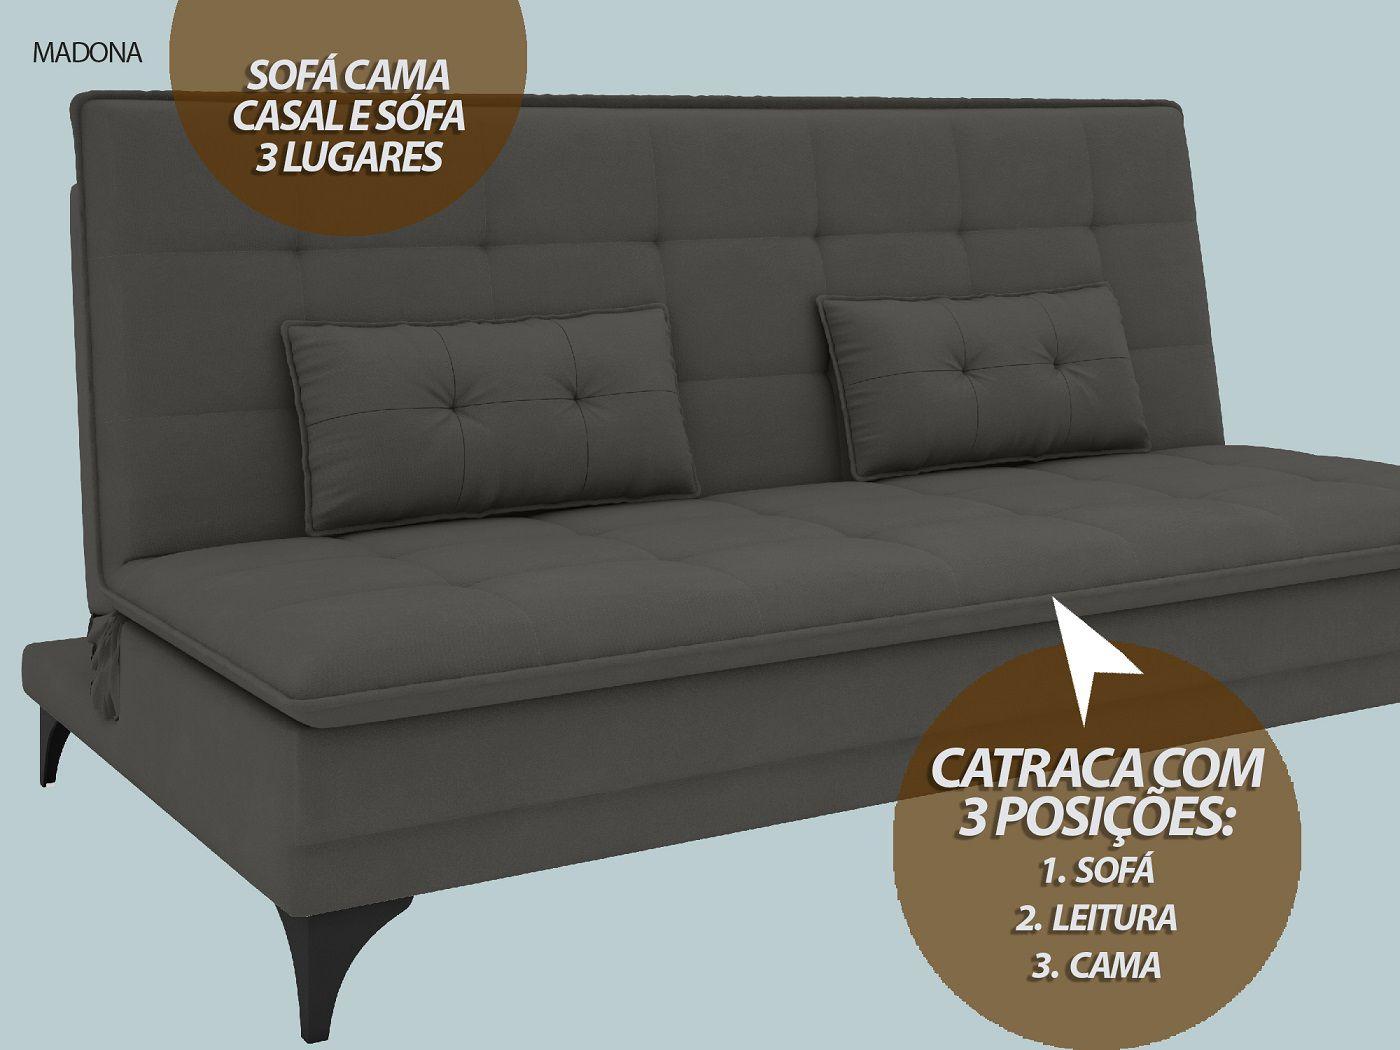 Sofá-Cama Casal Madona 1,87m Velosuede Cinza - NETSOFAS